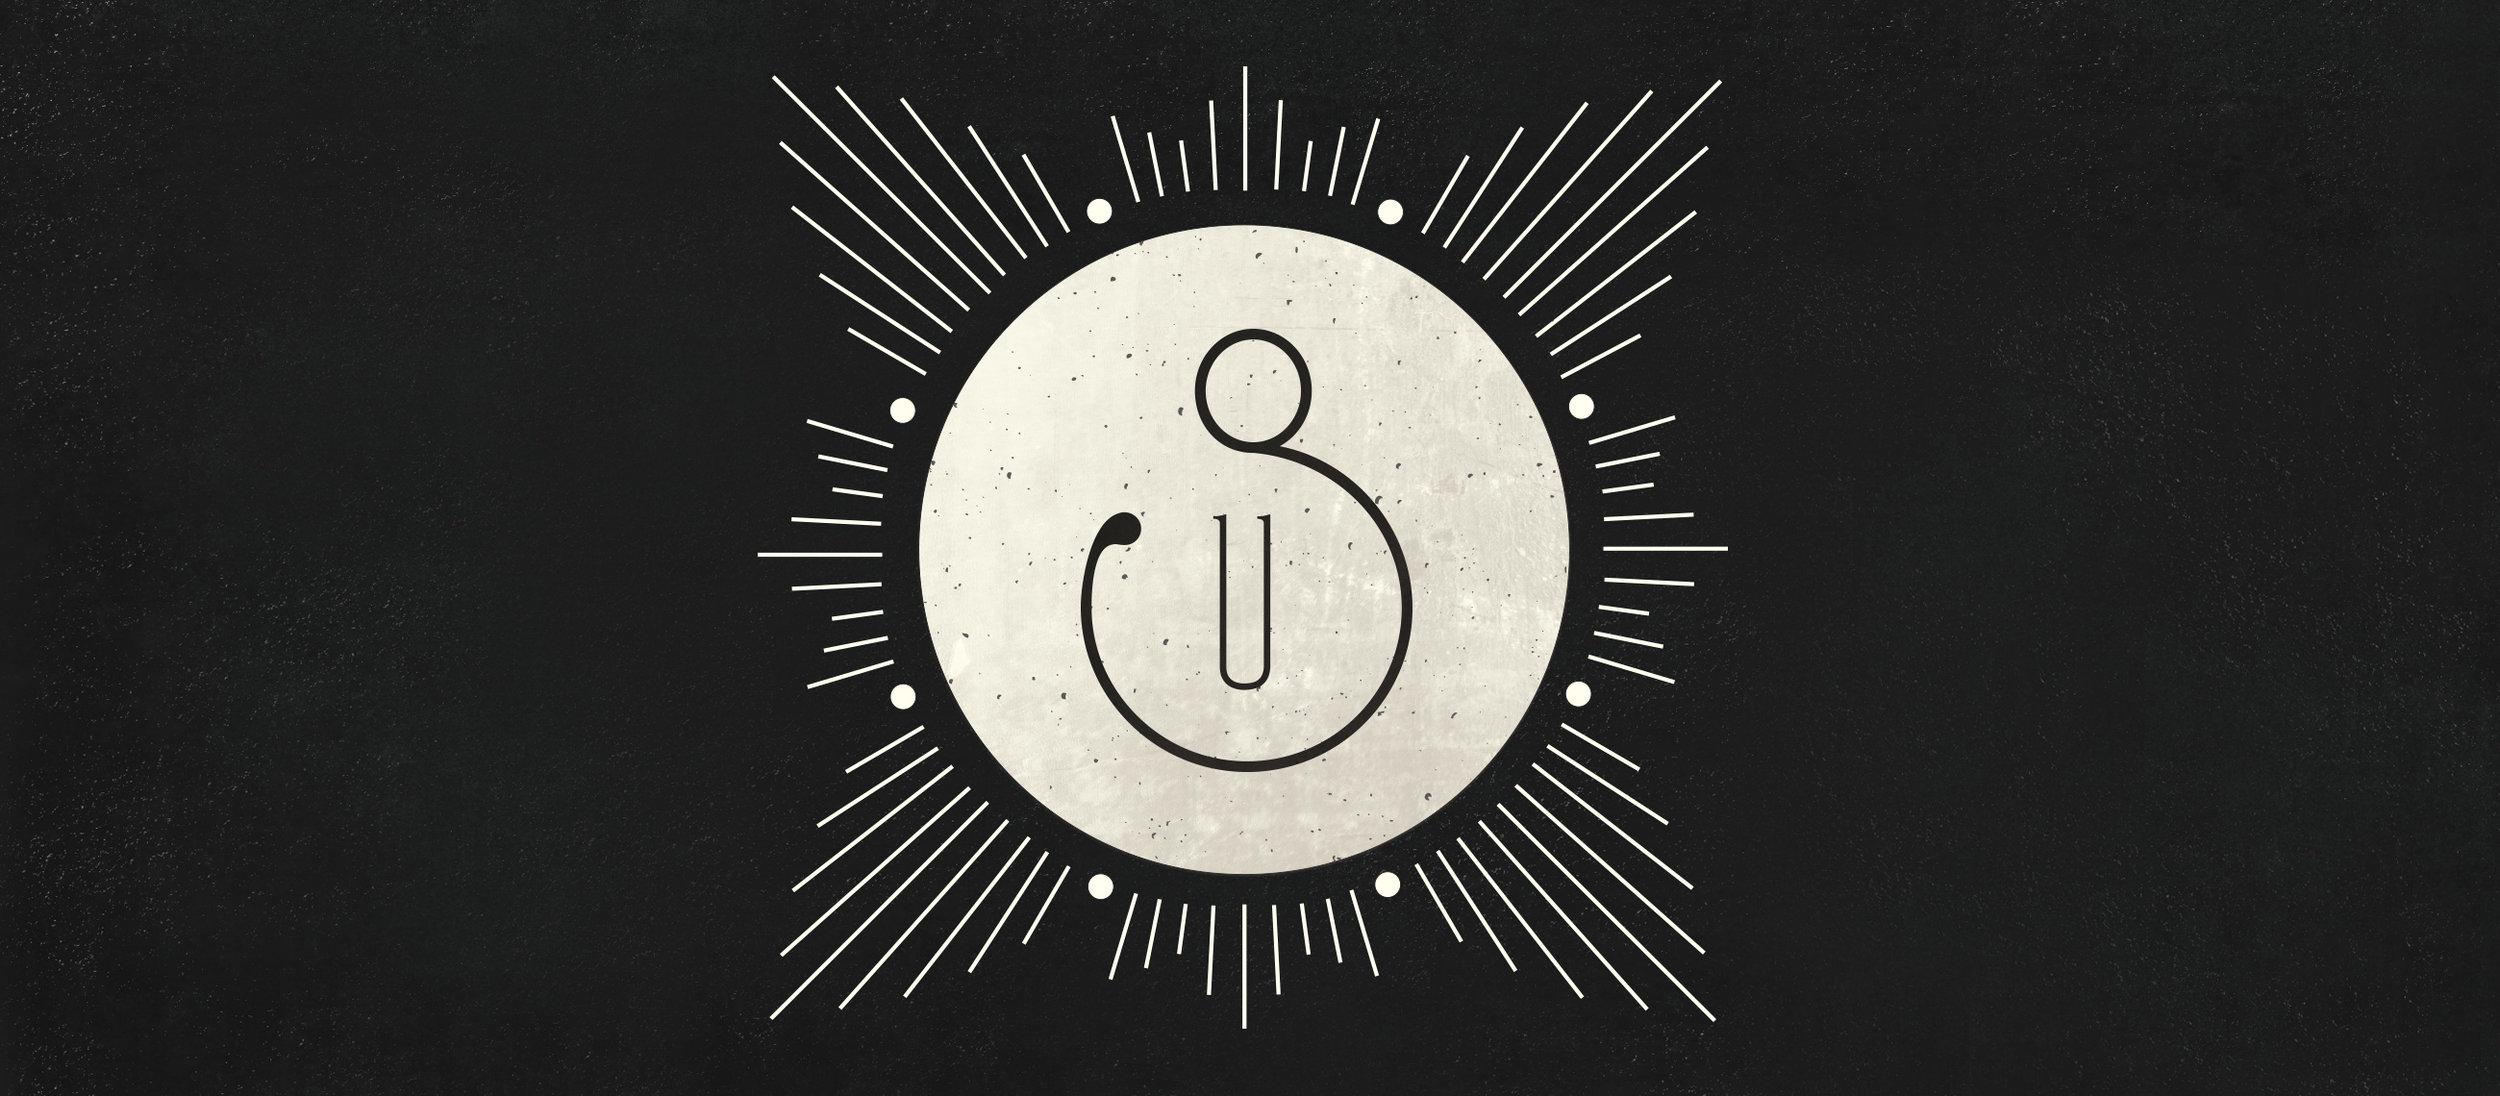 GU_Spotify_Banners_NEW.jpg